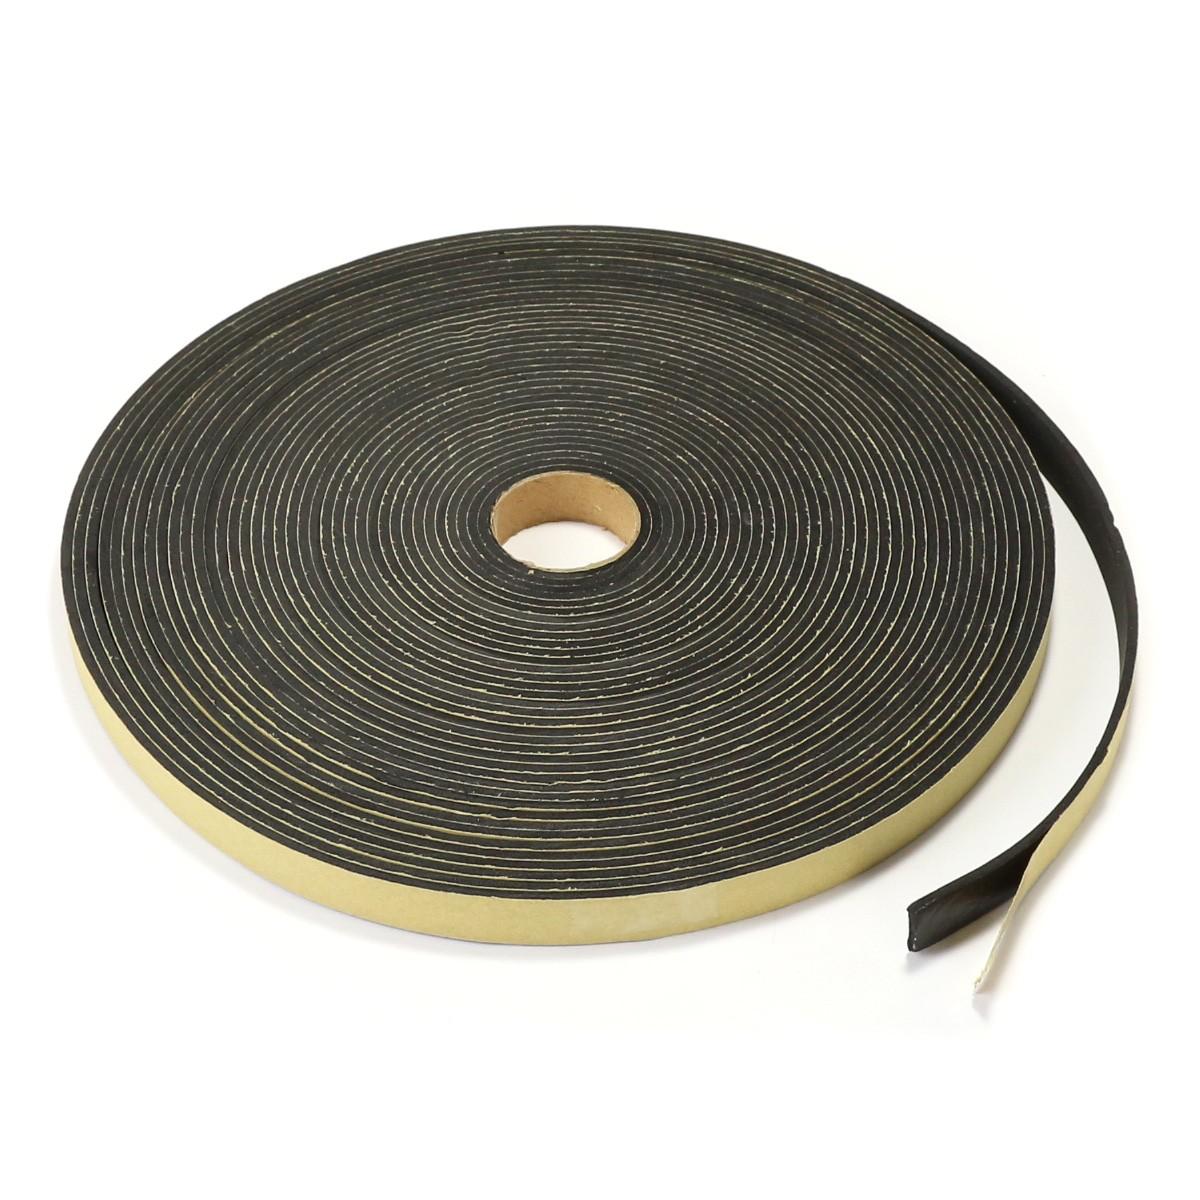 EVA Gasket for Speakers 18x3mm Black